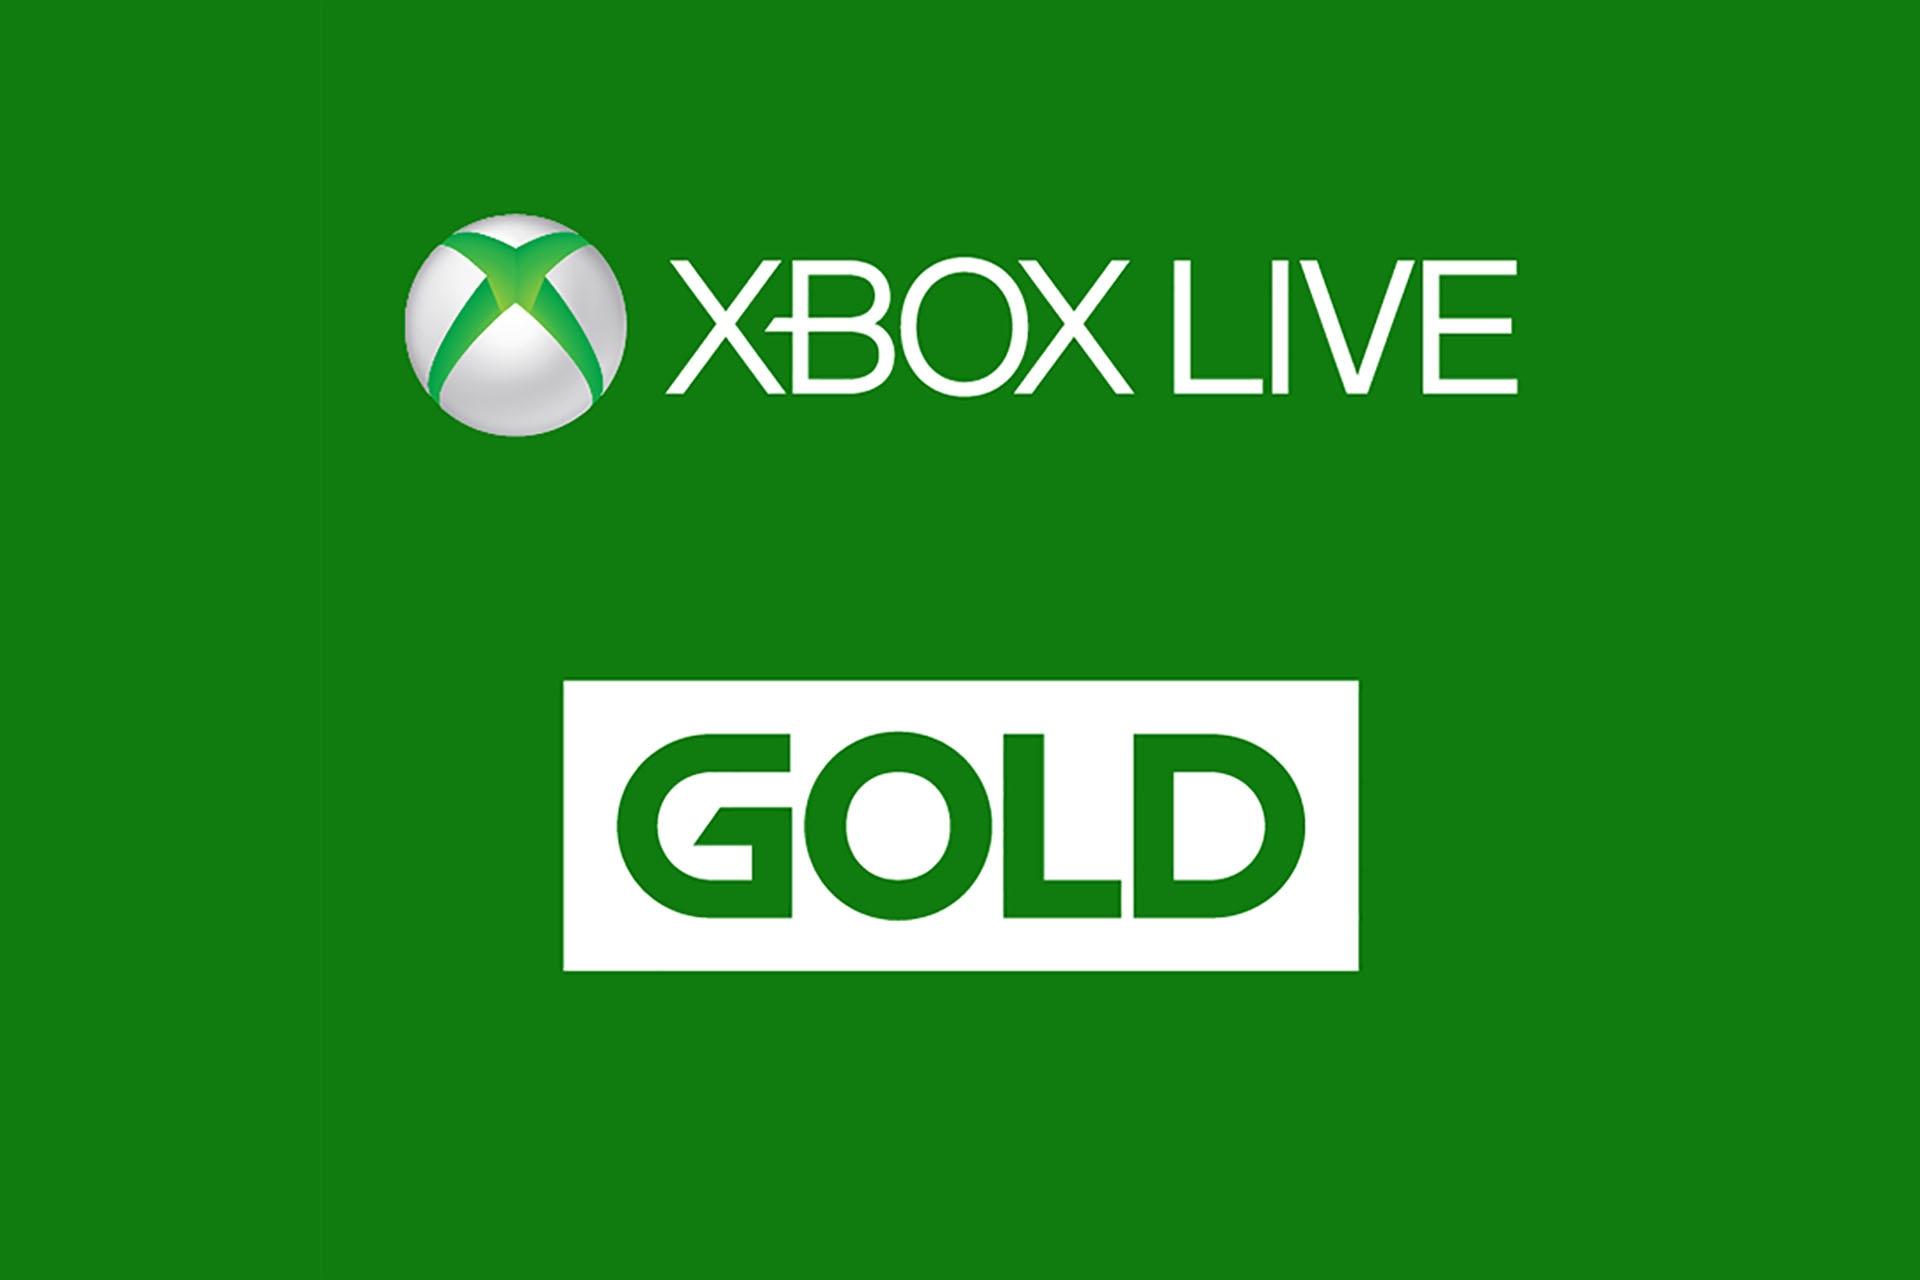 XBOX LIVE GOLD 90 DNI  3 MIESIĄCE  SUBSKRYPCJA